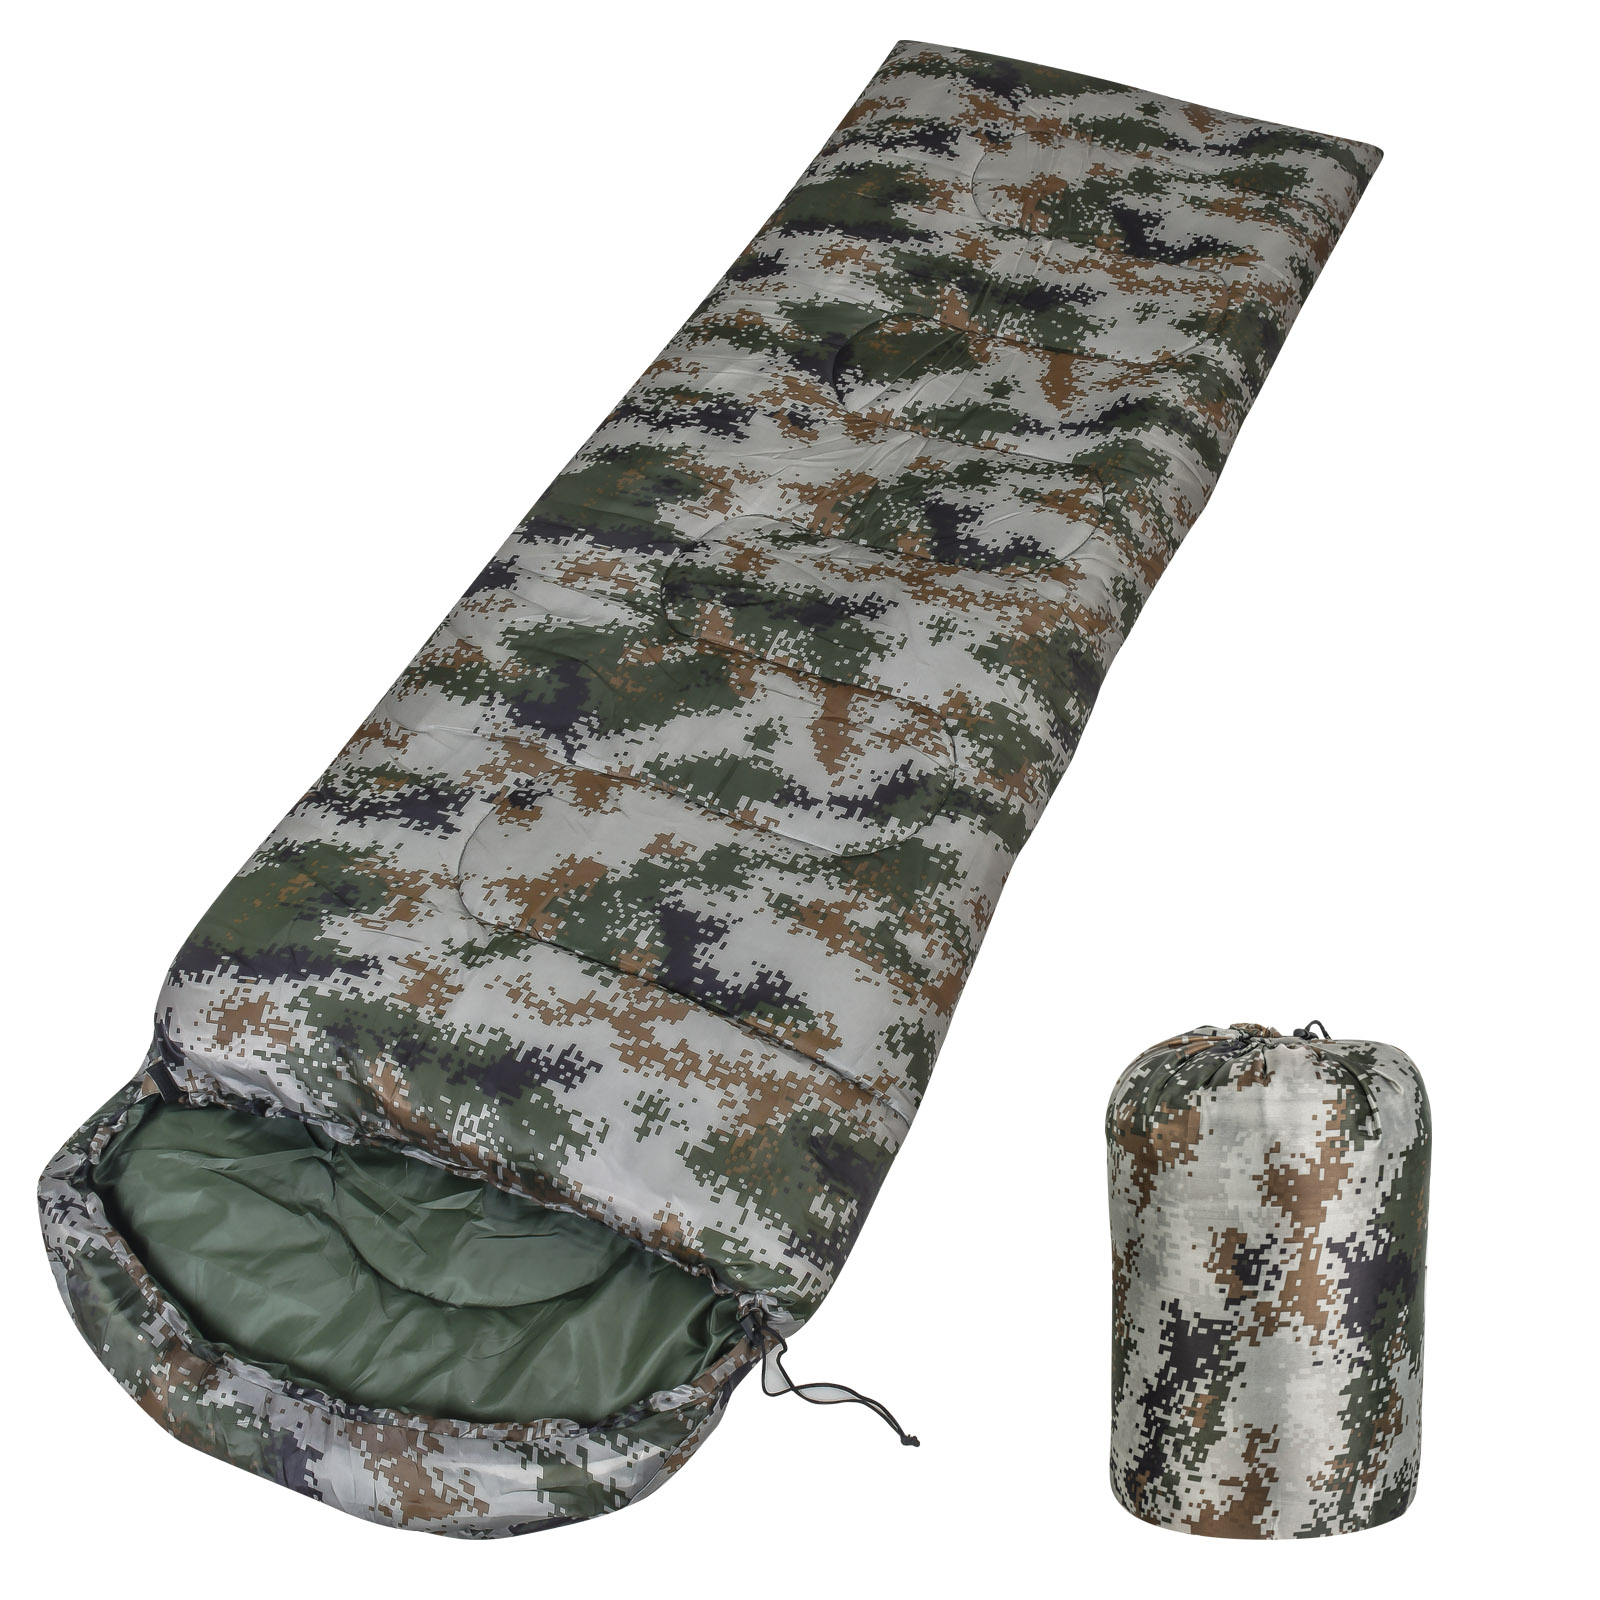 Армейский спальный мешок 210х70 1.8 кг